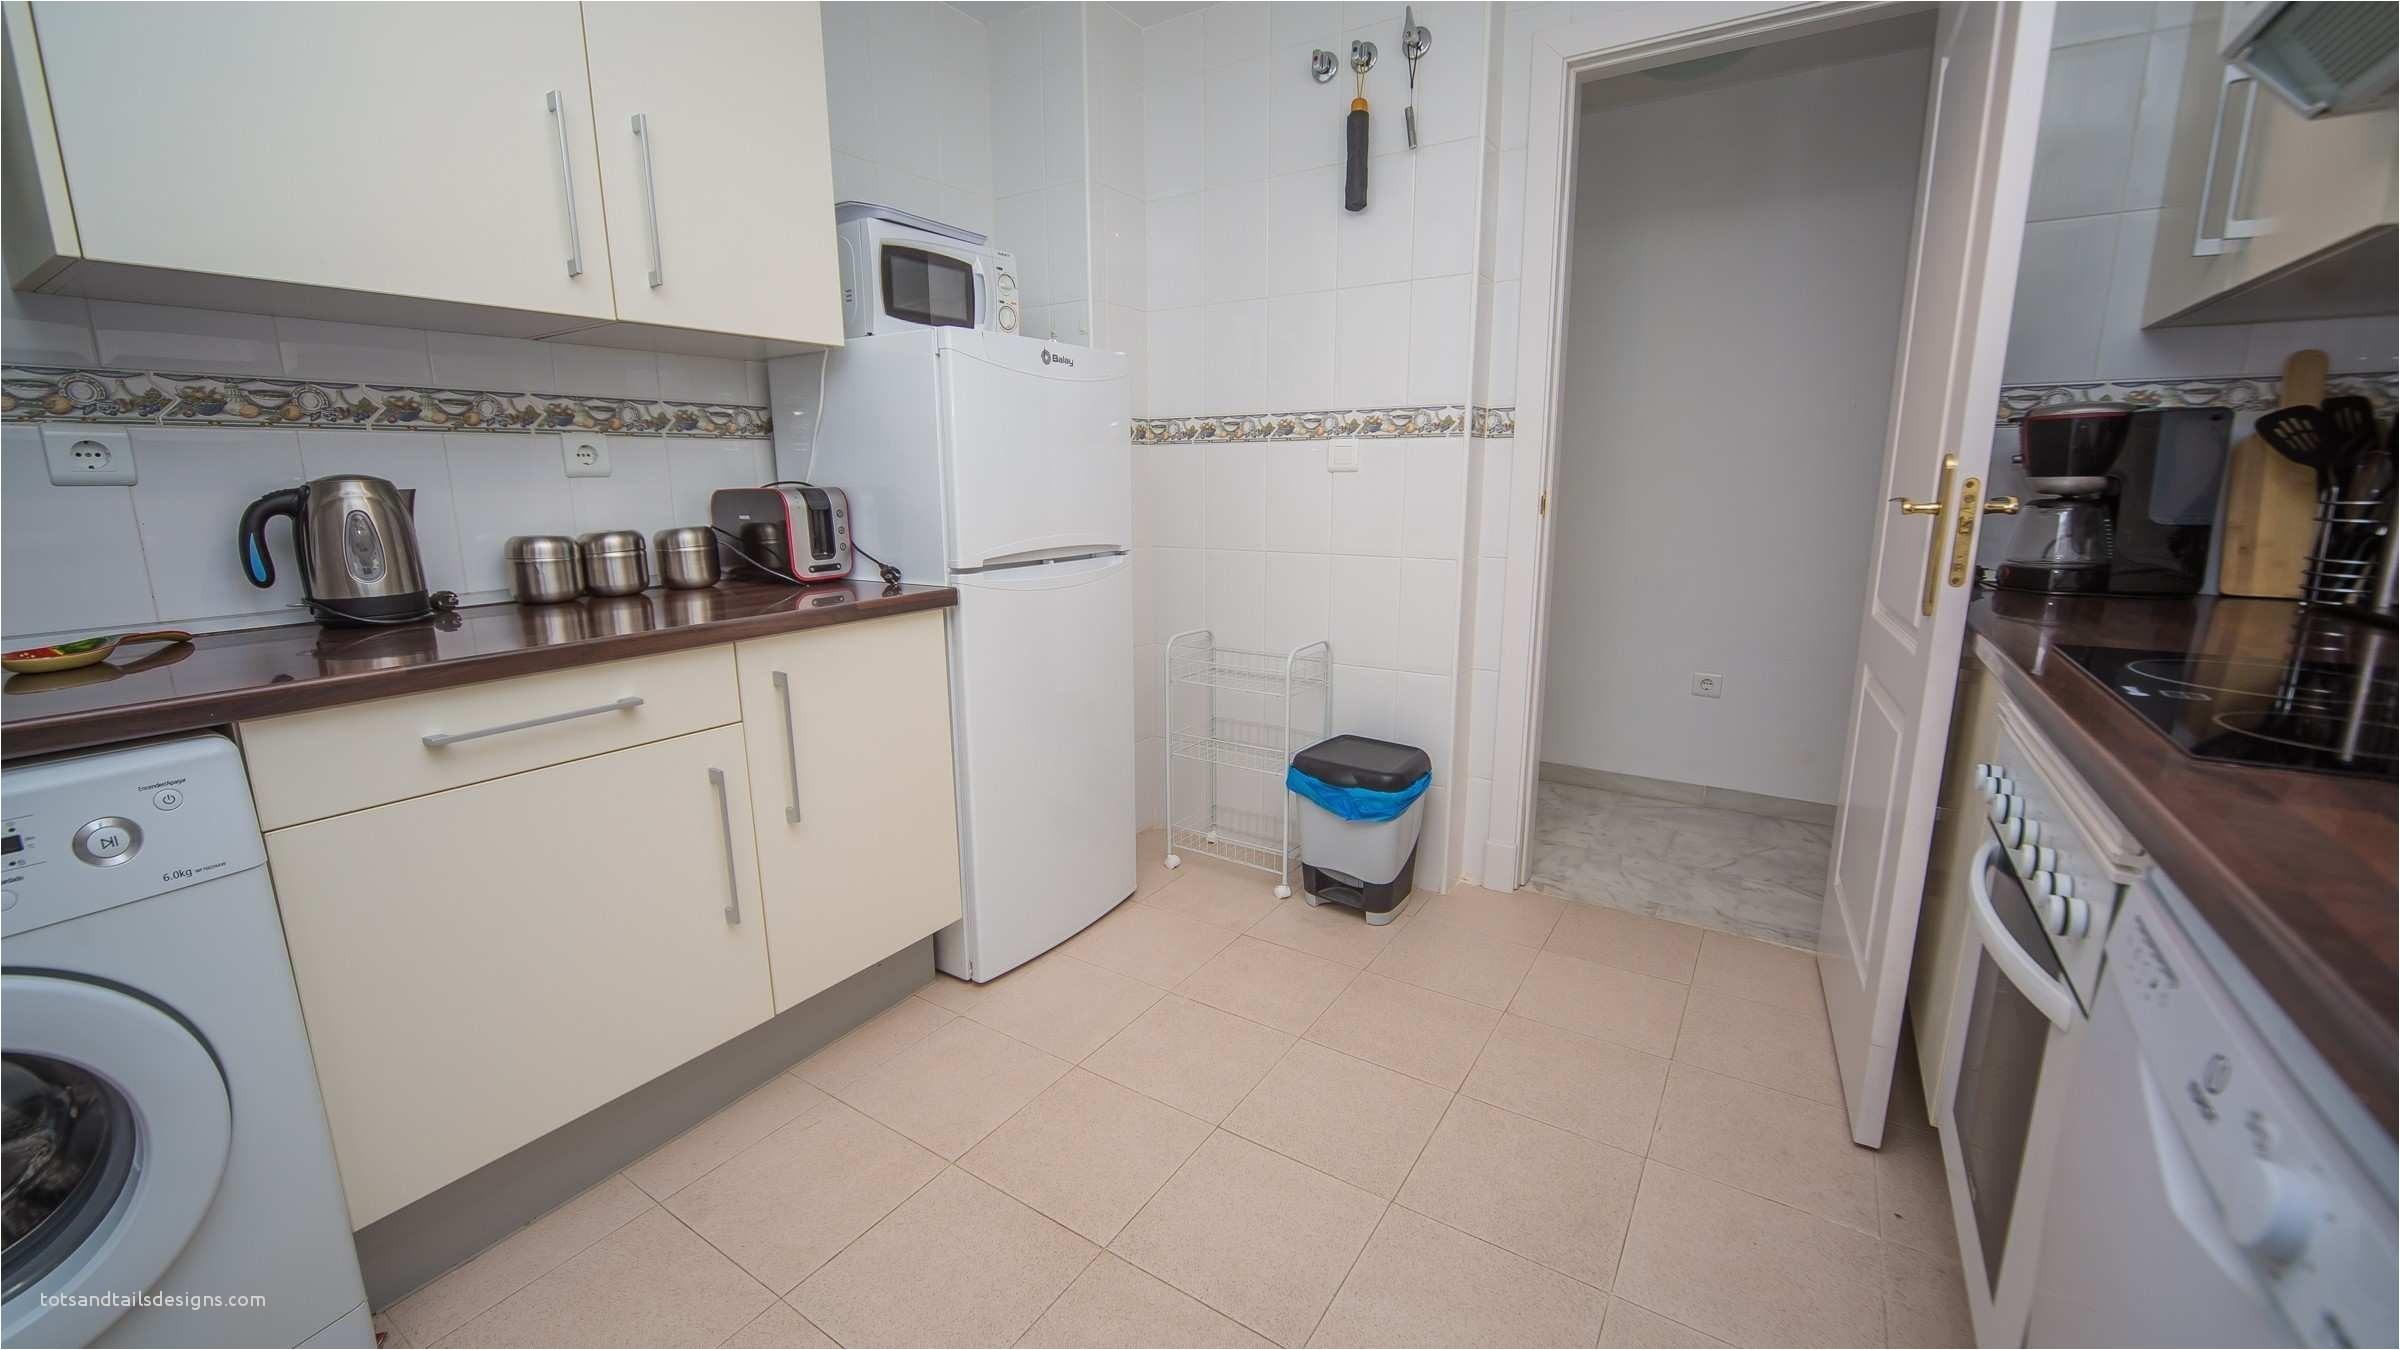 bathtub refinishing kit spray best southwestern kitchen elegant apartments in casares hc pensamiento 0d